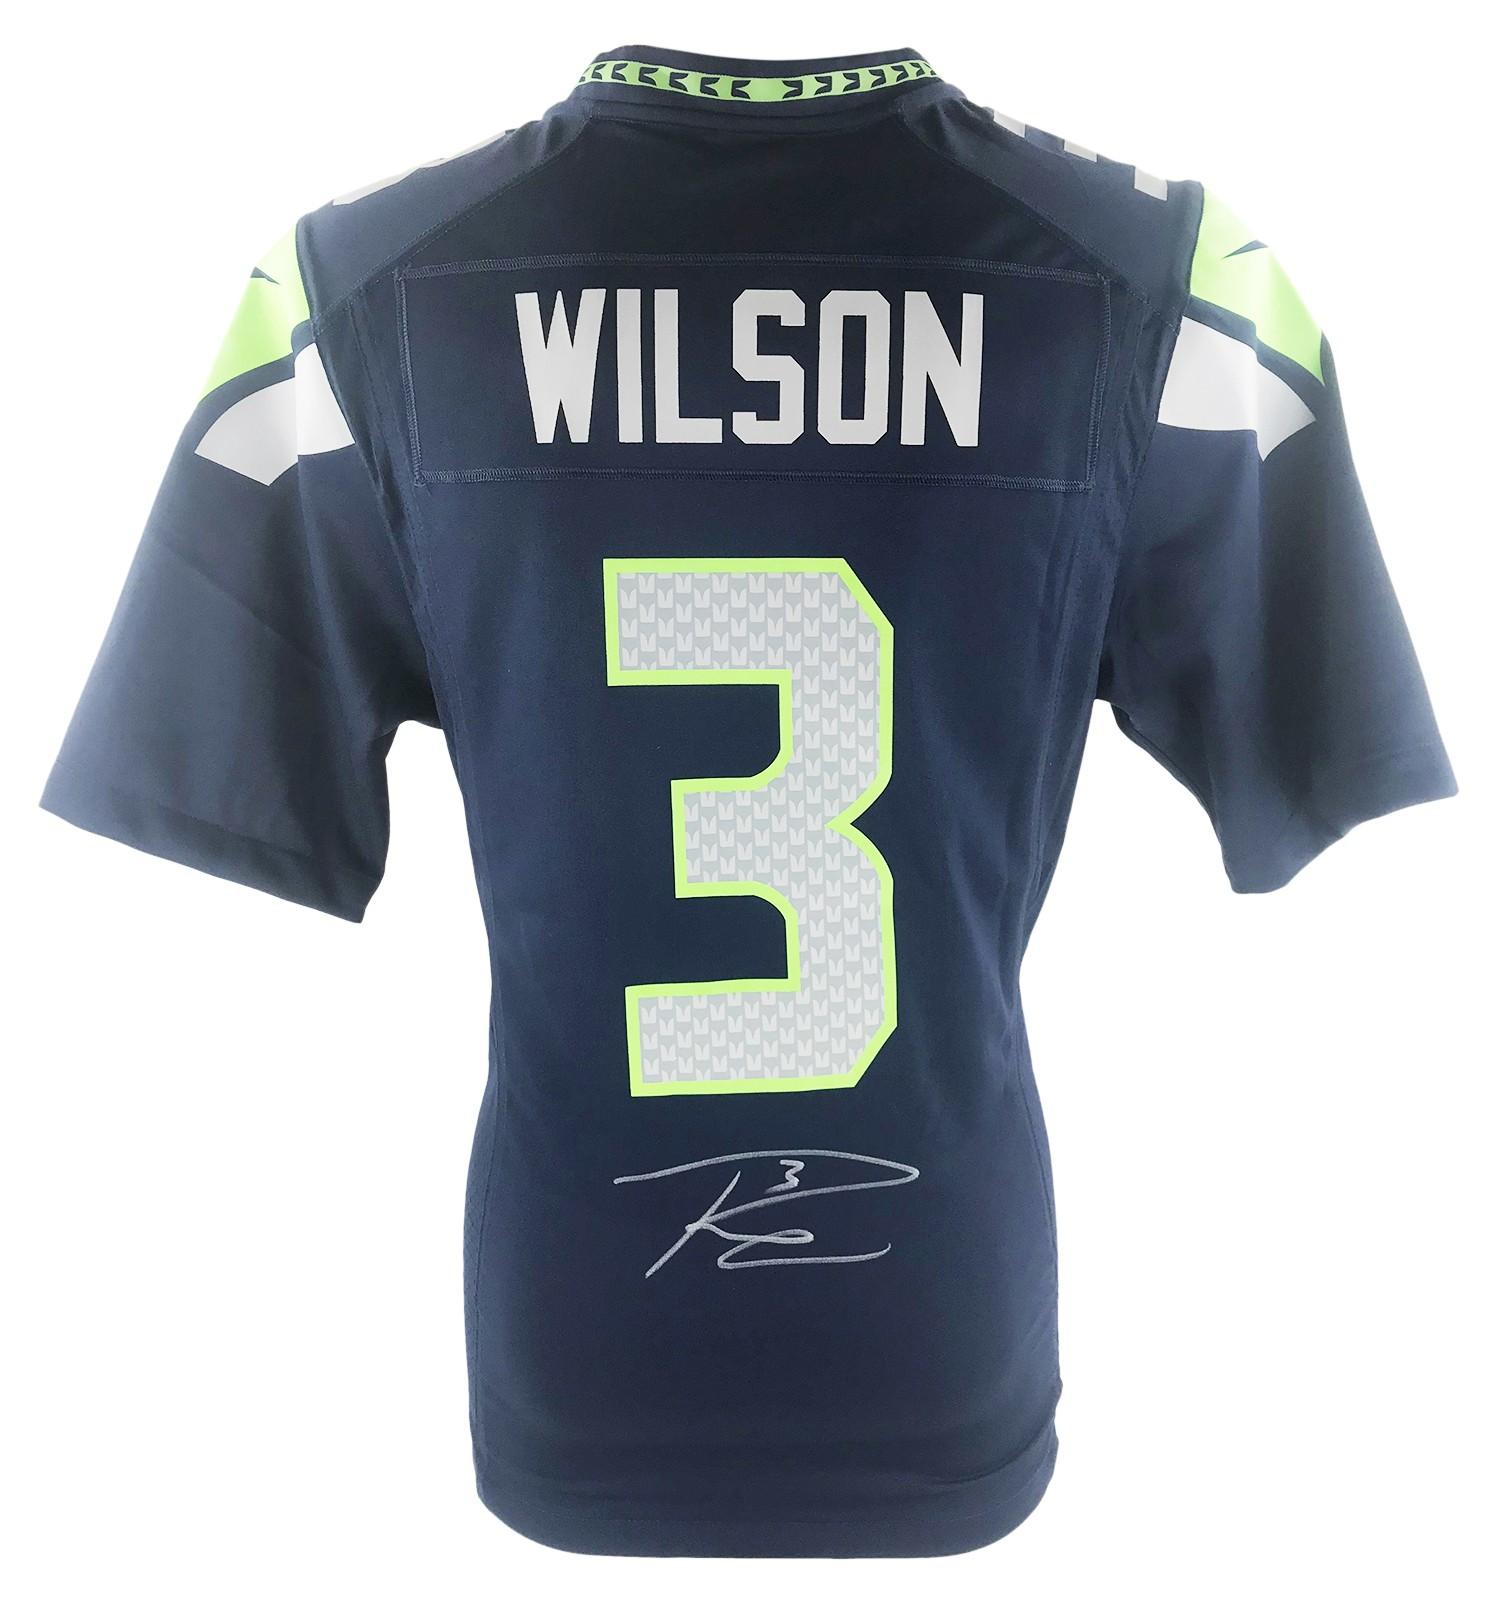 Russell Wilson Signed Jersey - Seattle Seahawks Shirt 2020